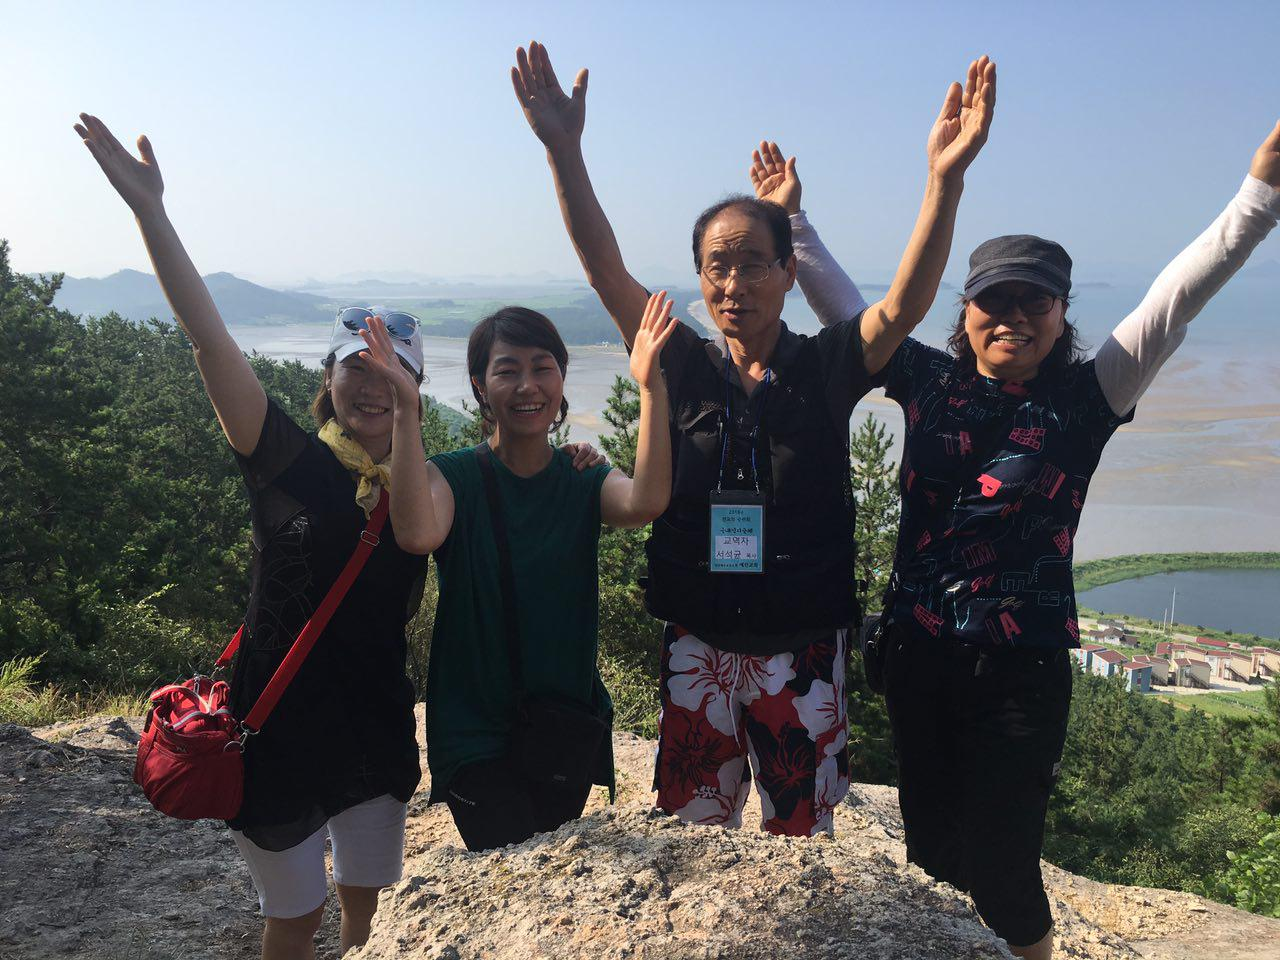 photo_2016-08-13_14-19-49.jpg